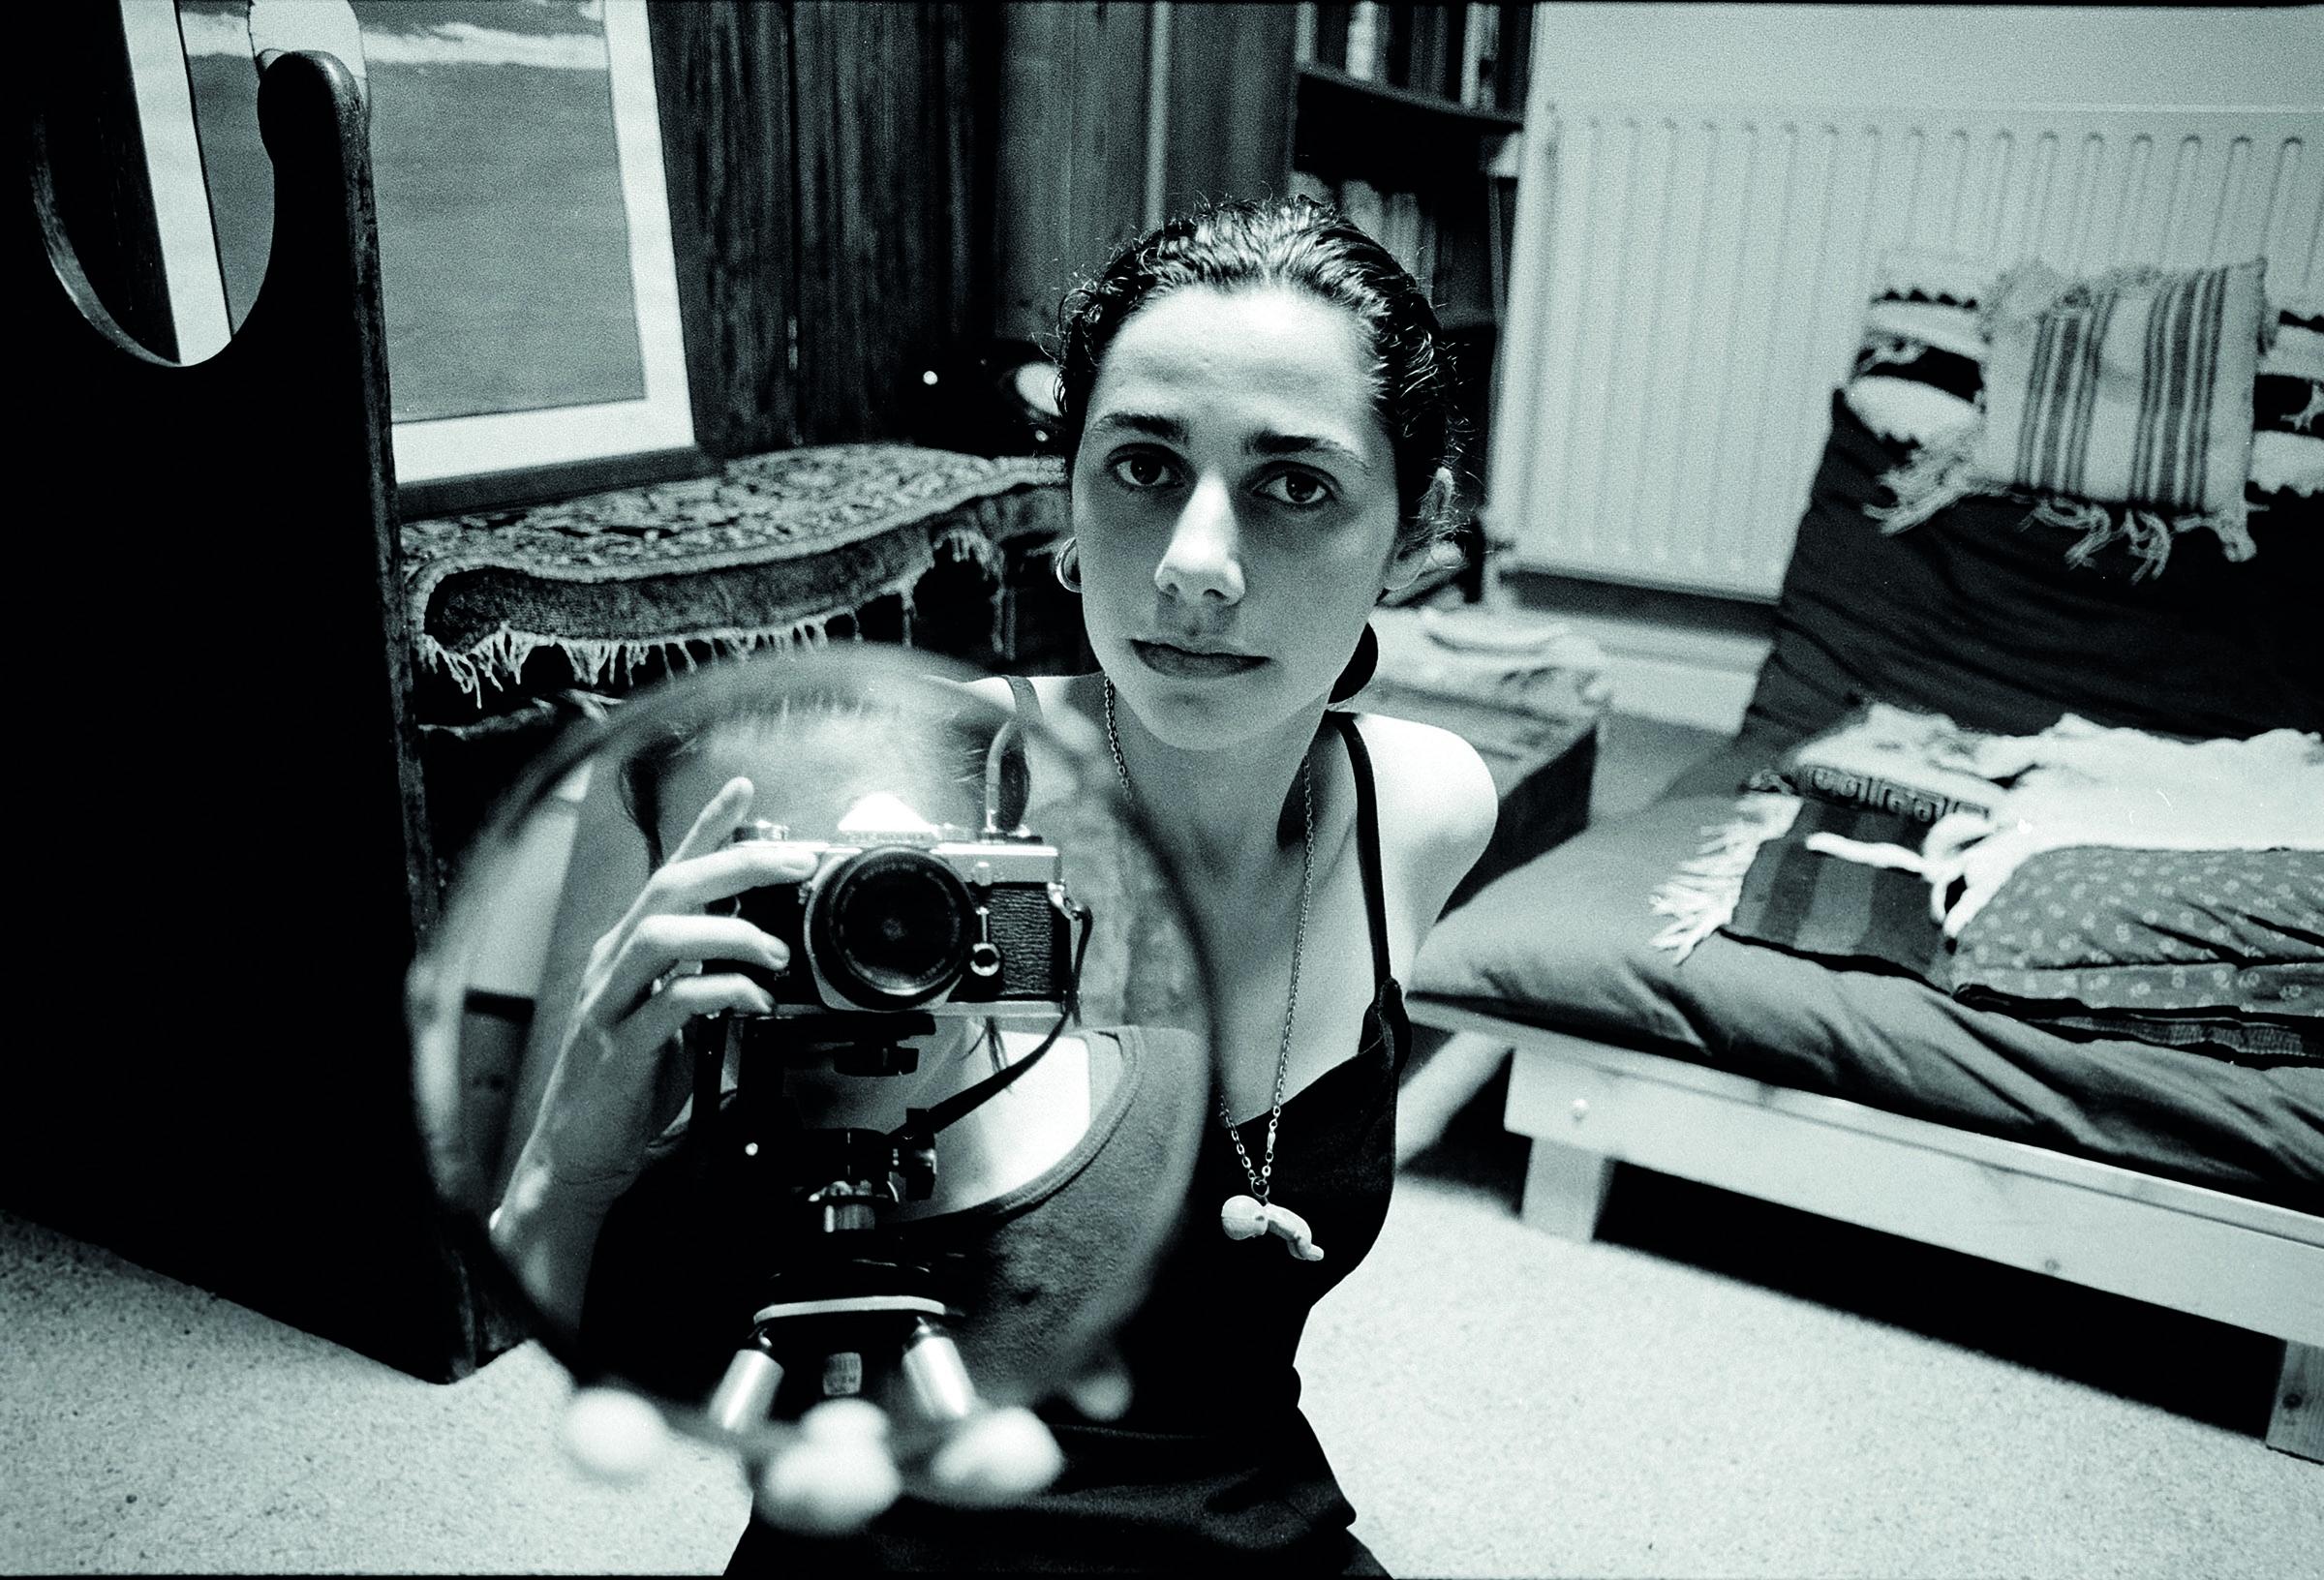 PJ HARVEY to reissue entire back catalogue on vinyl - Hear 'Sheela-Na-Gig' Demo Now 1